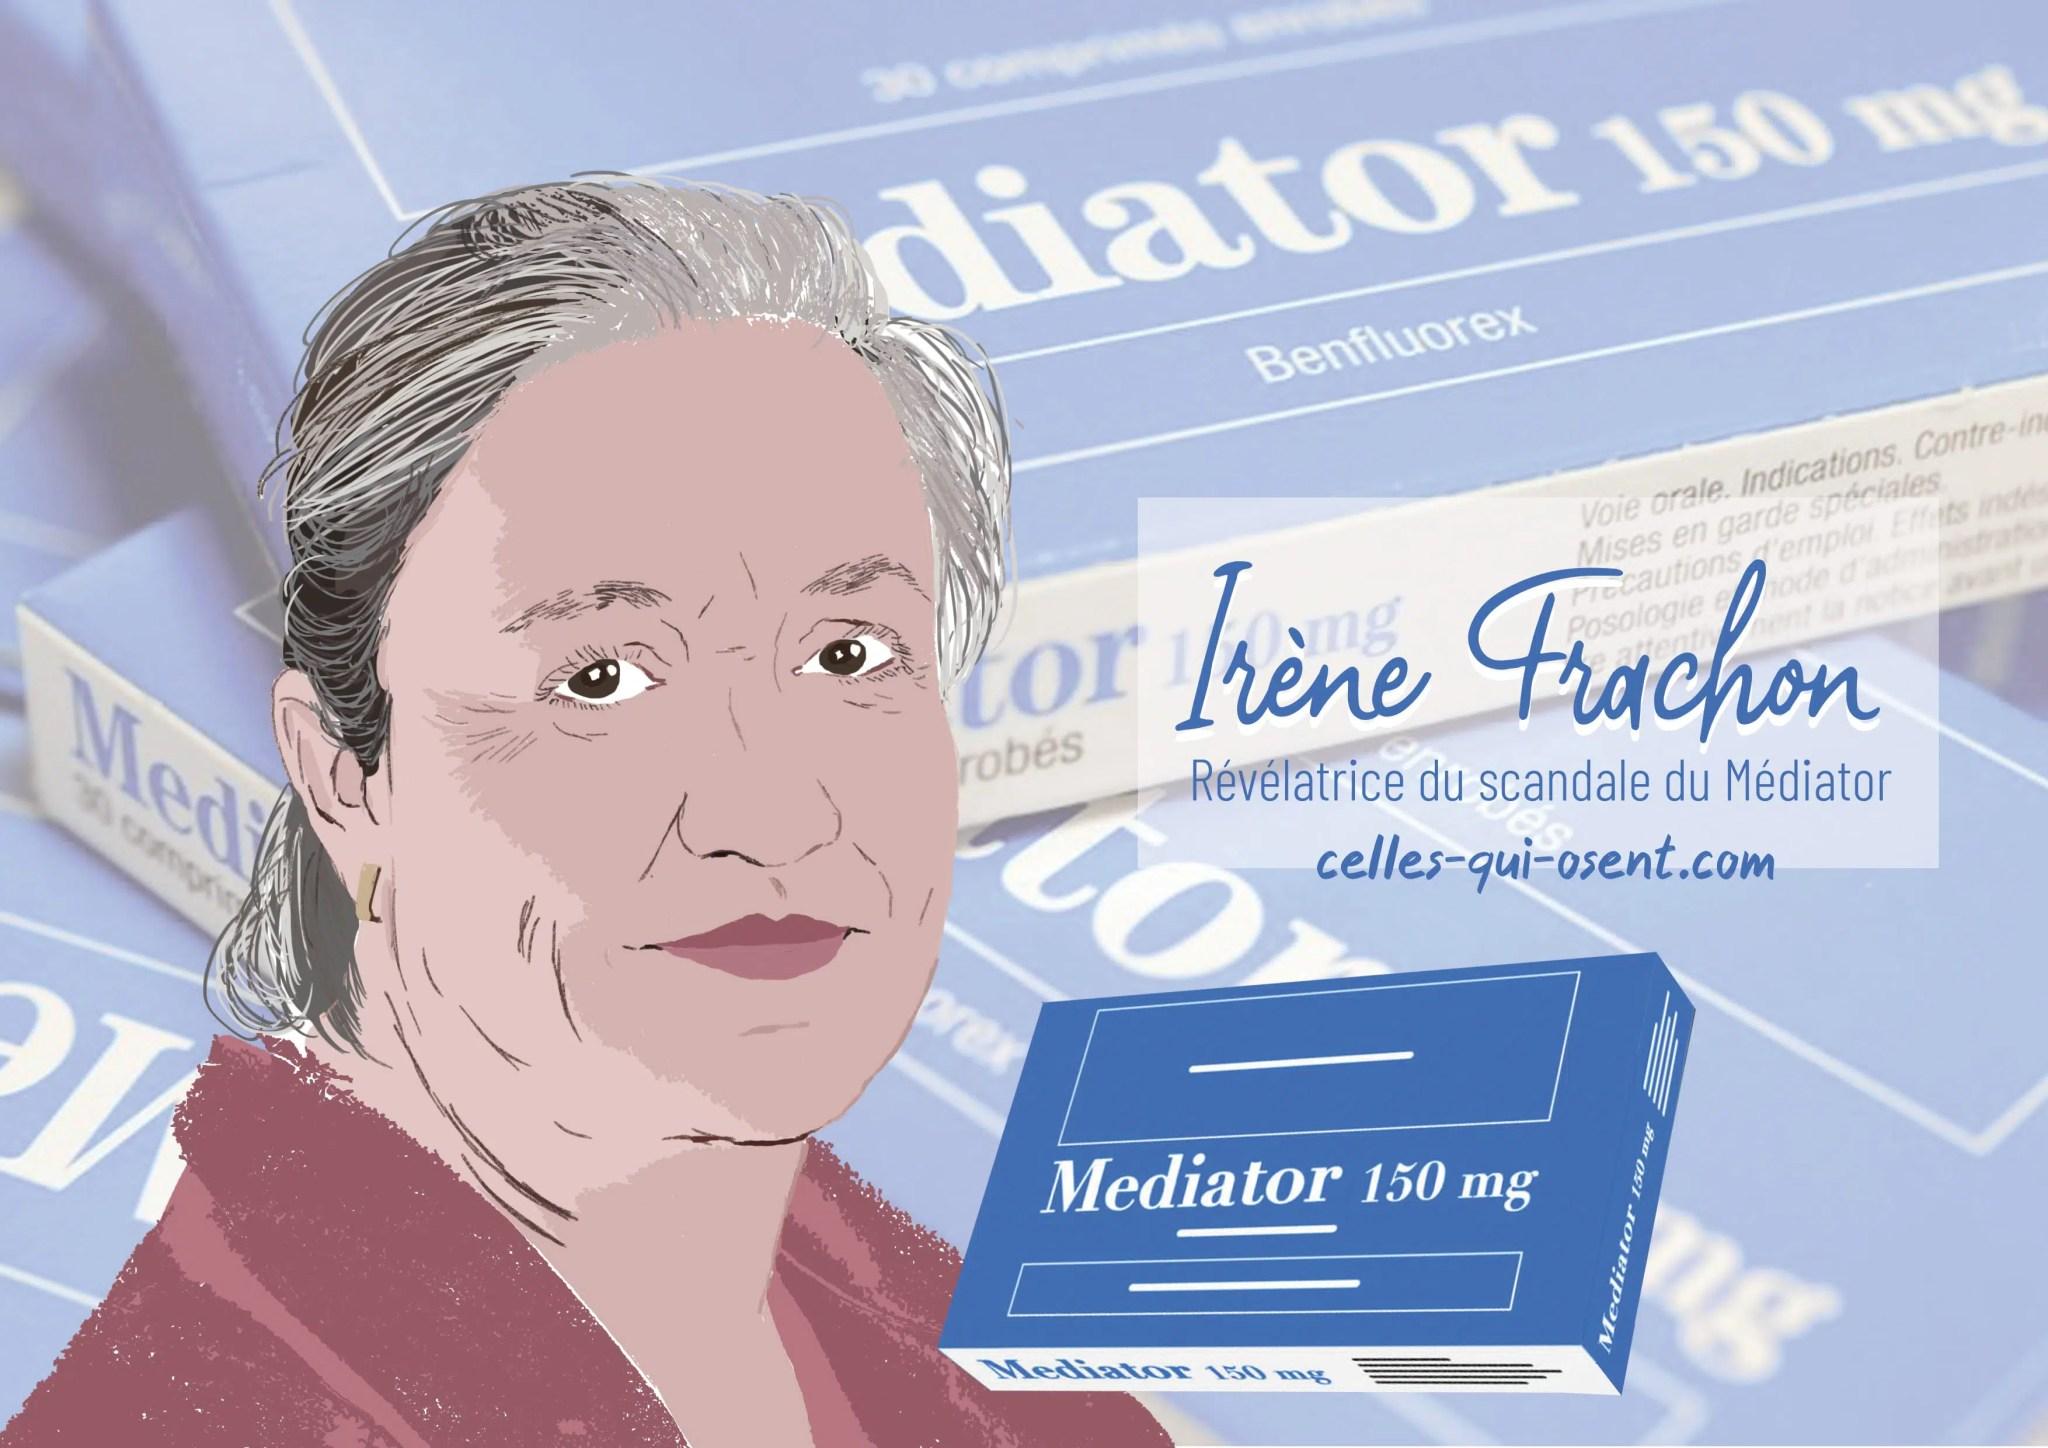 irene-frachon-mediator-celles-qui-osent-CQO